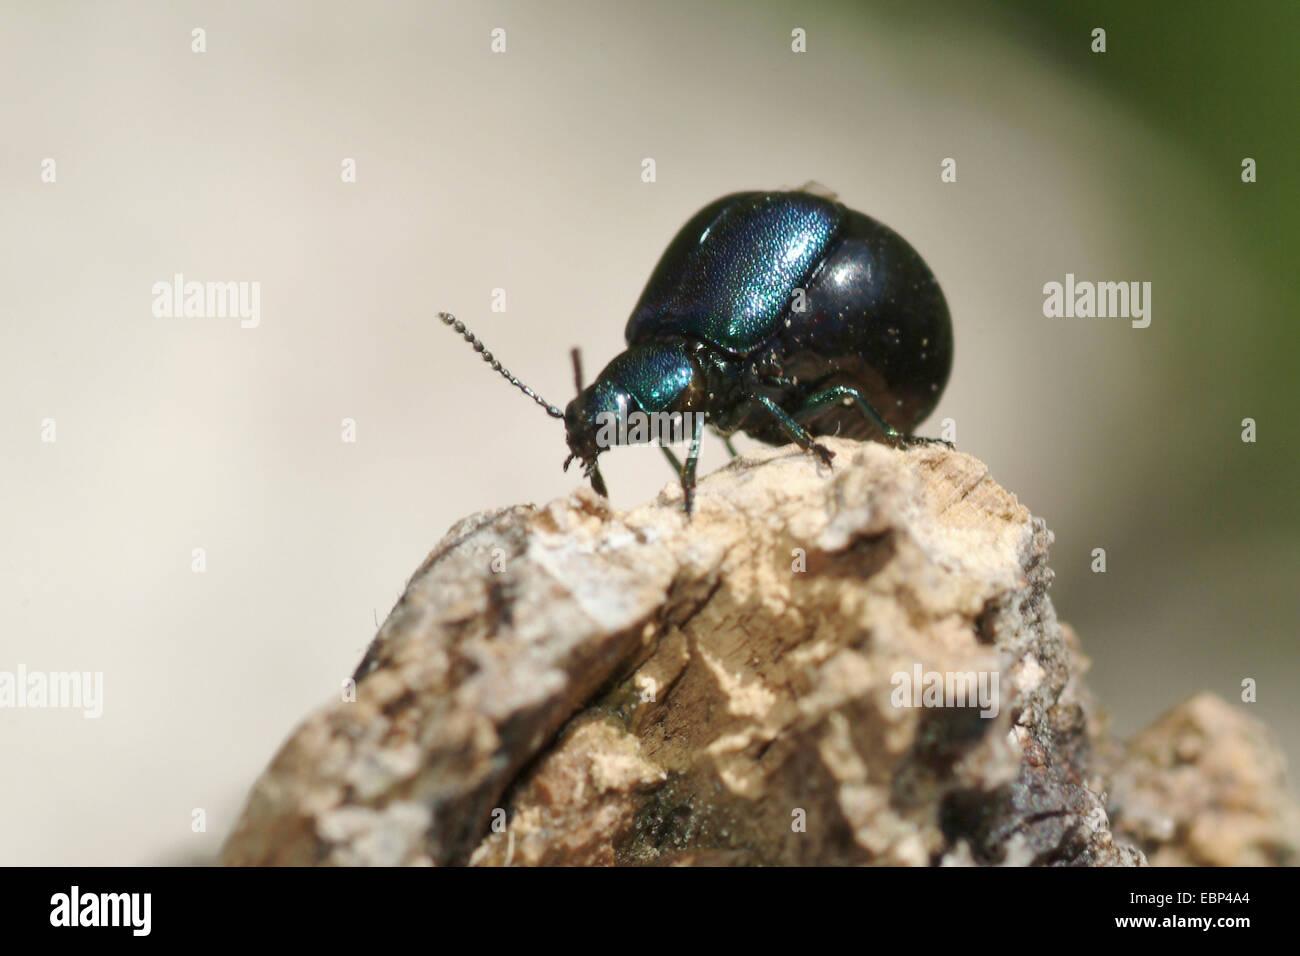 Green Dock Beetle (Gastrophysa viridula), female on a stone, Switzerland, Bernese Oberland - Stock Image